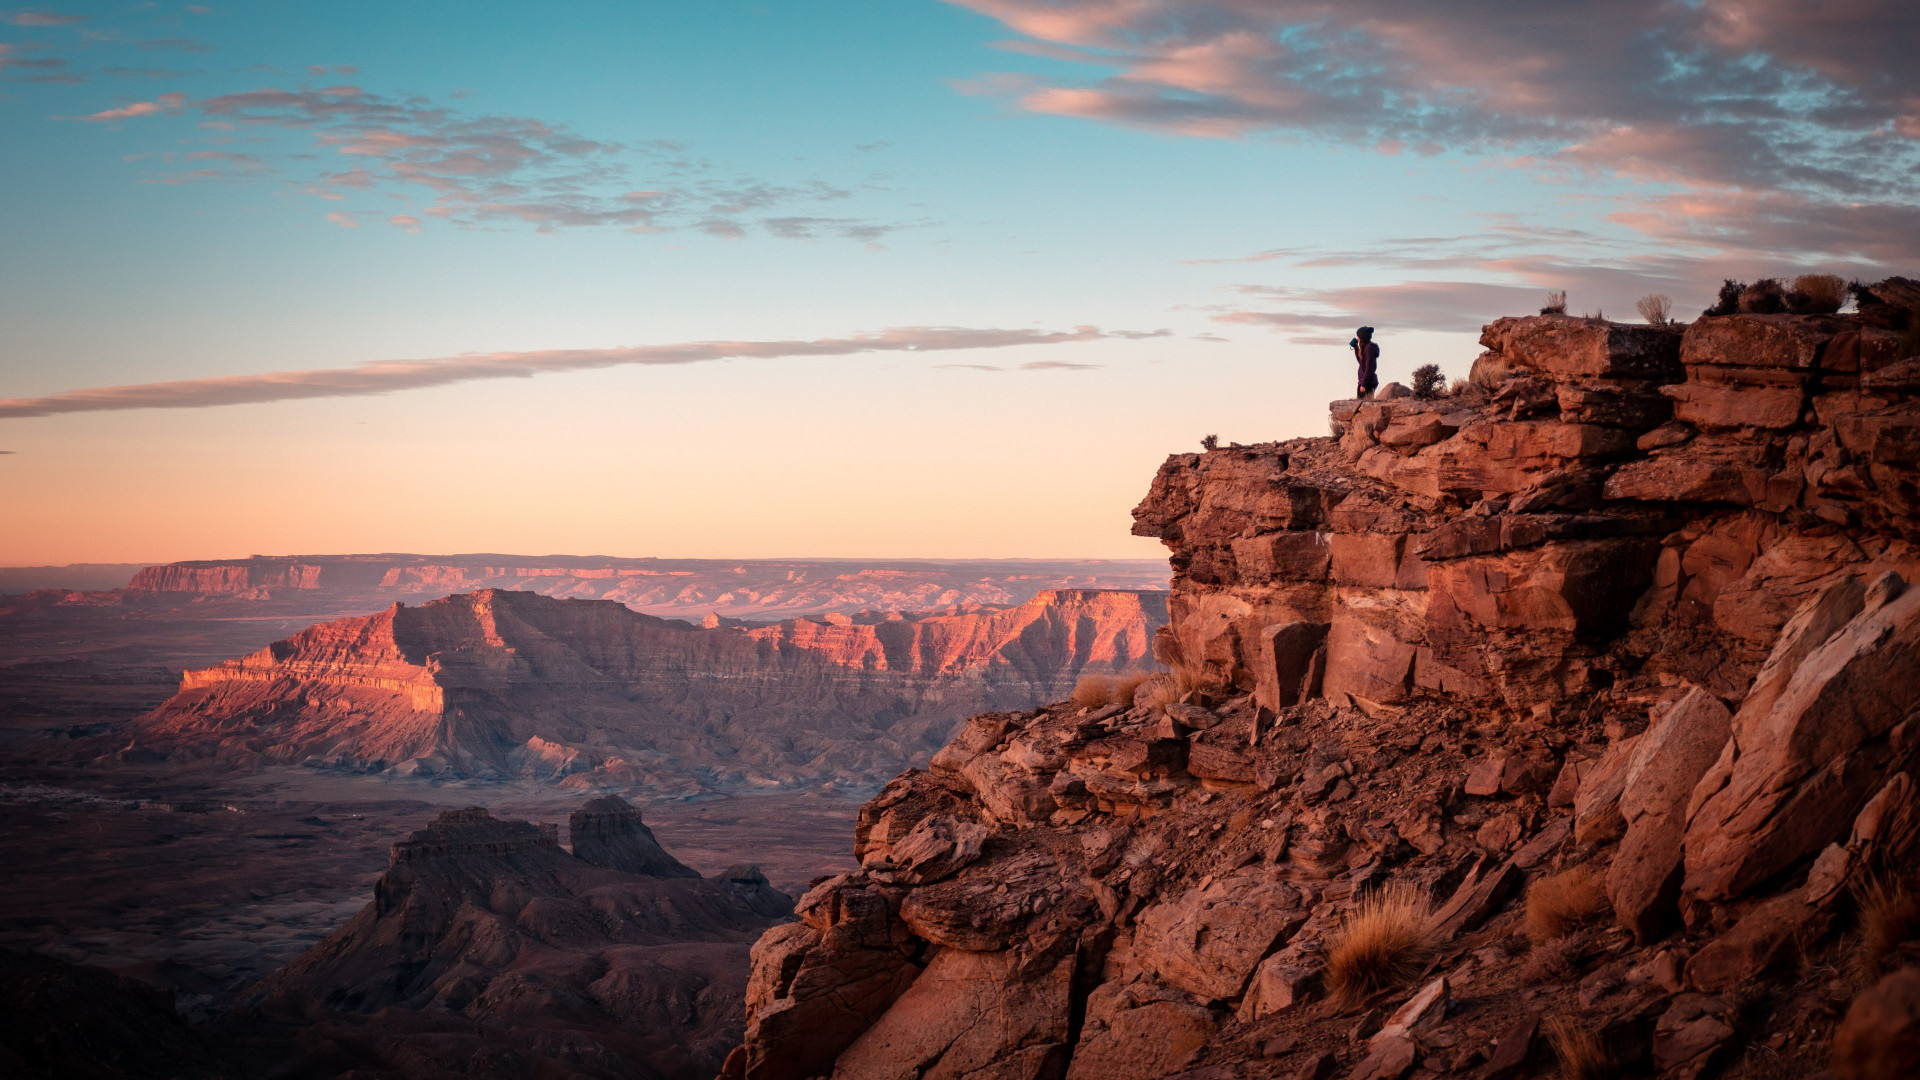 Download Wallpaper Canyon Sunset Desert Landscape